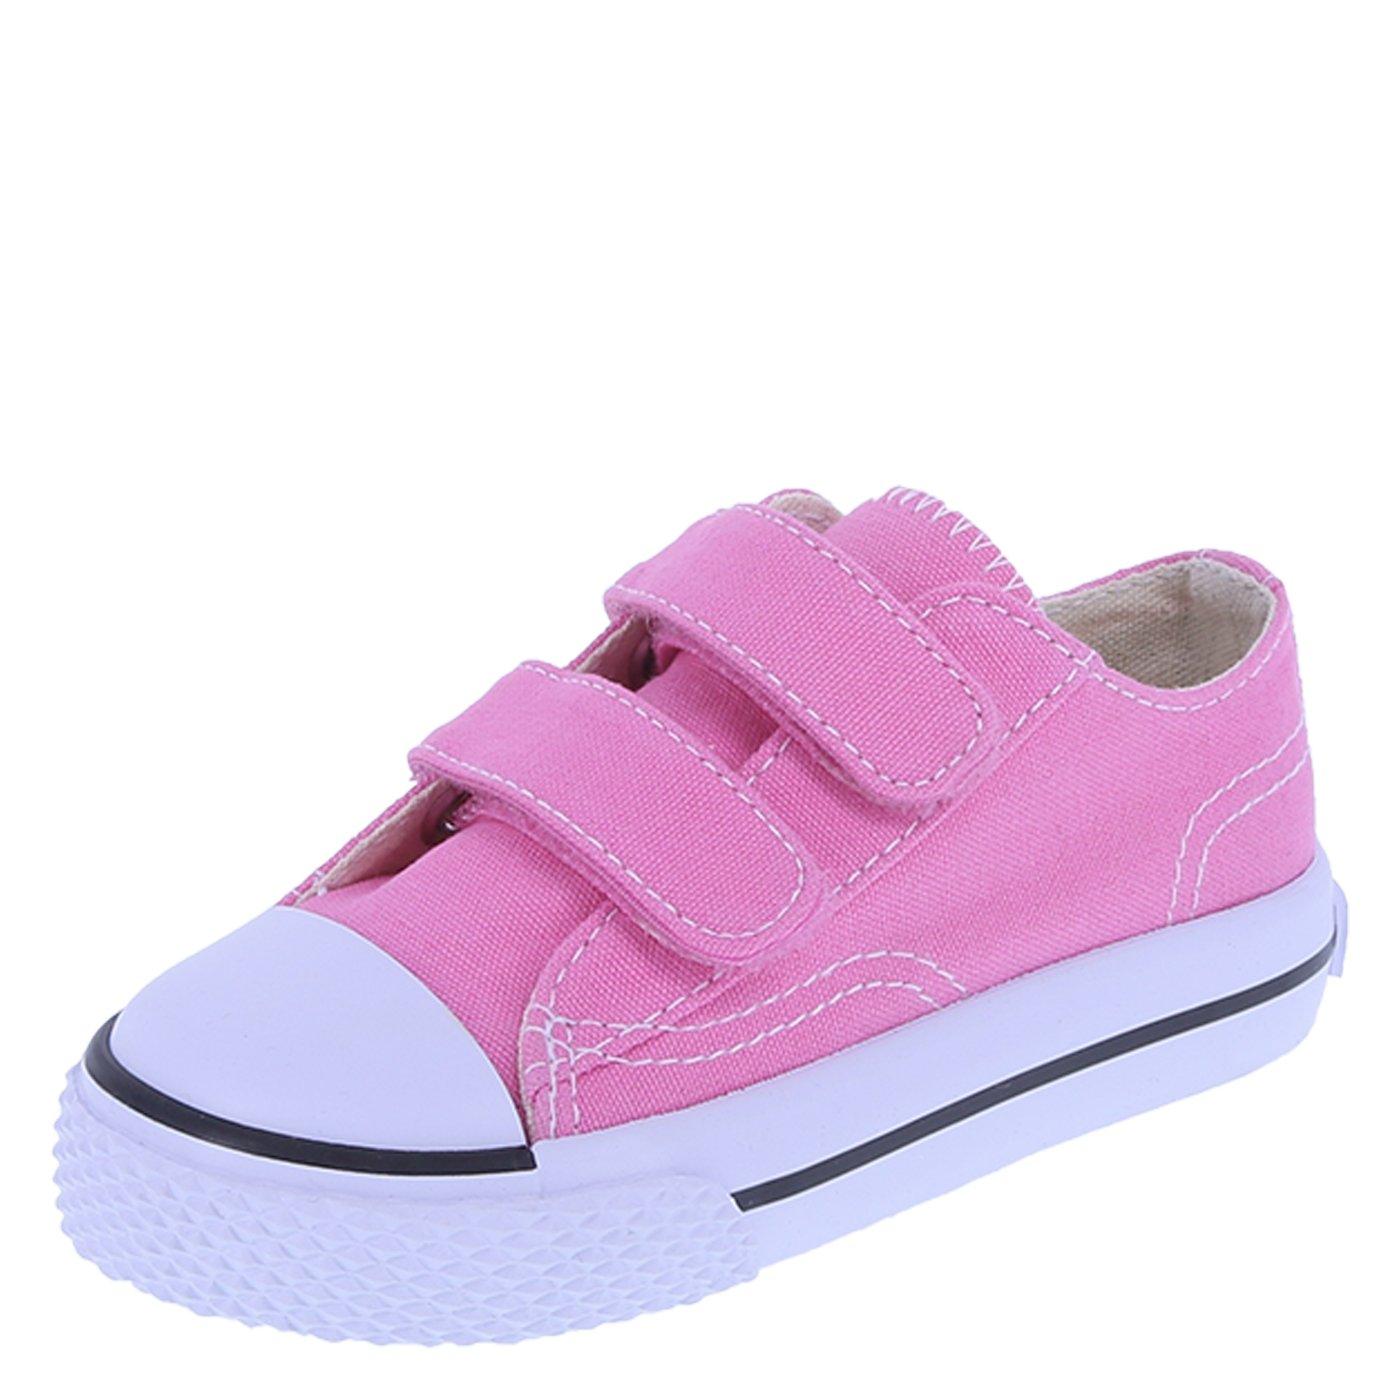 Airwalk Kids Toddler Legacee Sneaker 078911-Parent